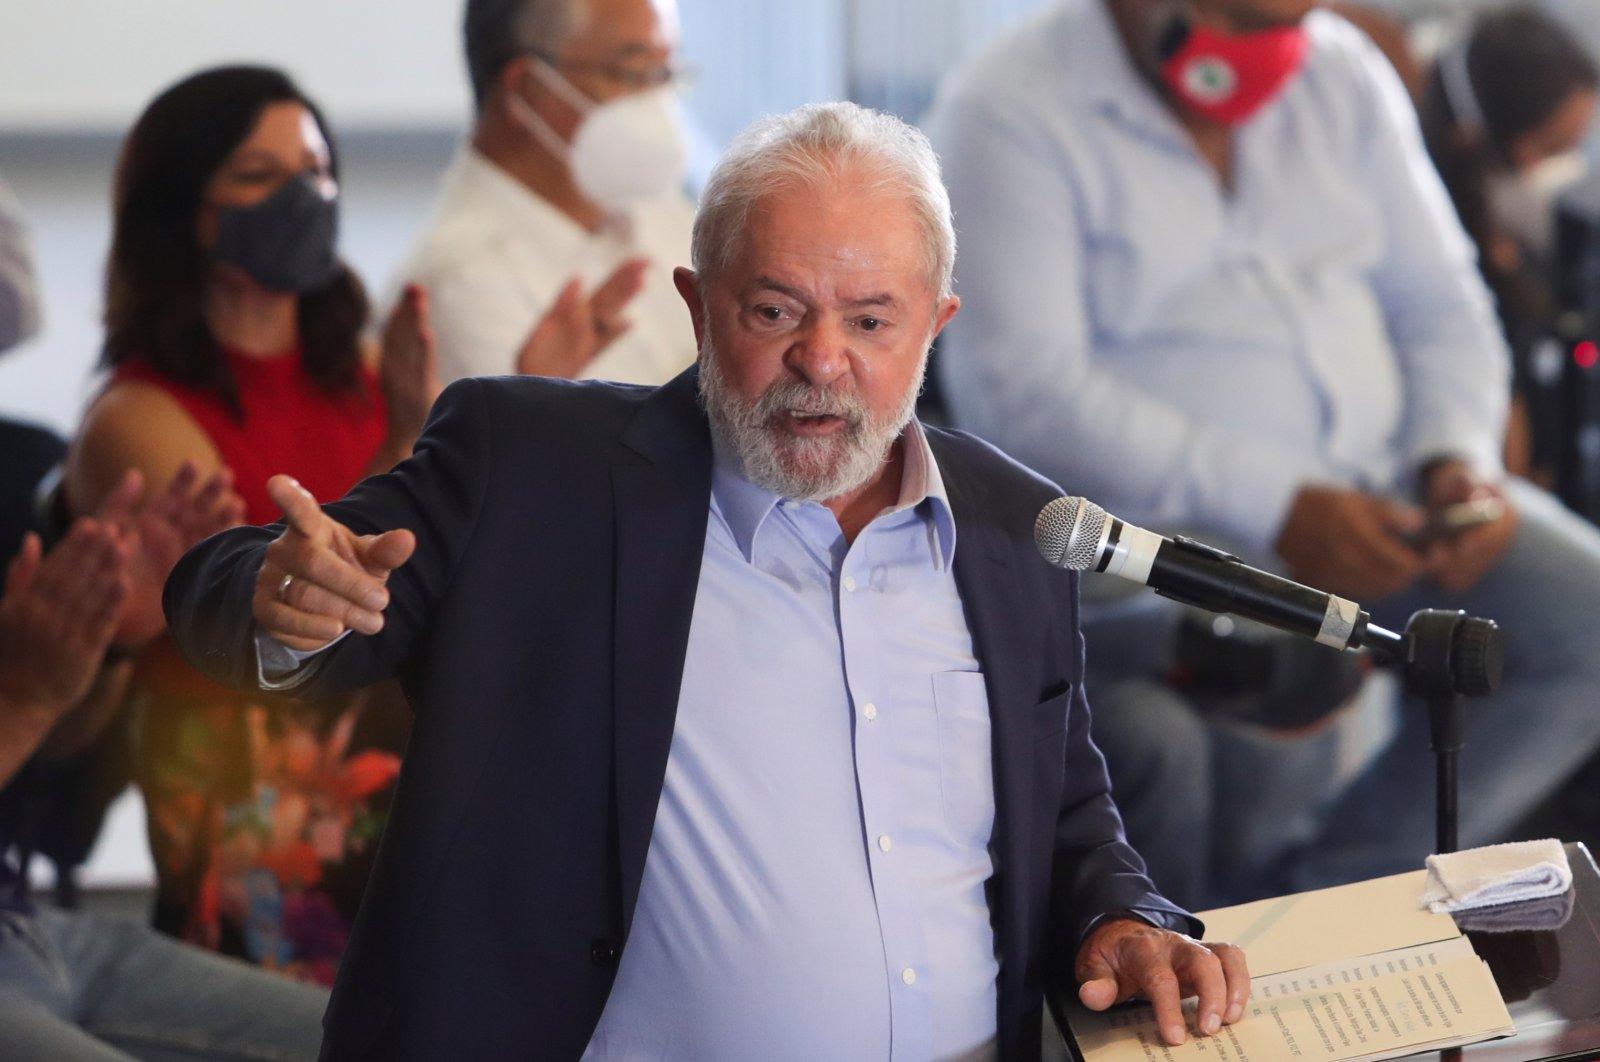 Brazil's former President Luiz Inacio Lula da Silva gestures as he speaks during a news conference in Sao Bernardo do Campo near Sao Paulo, Brazil March 10, 2021. (Reuters Photo)